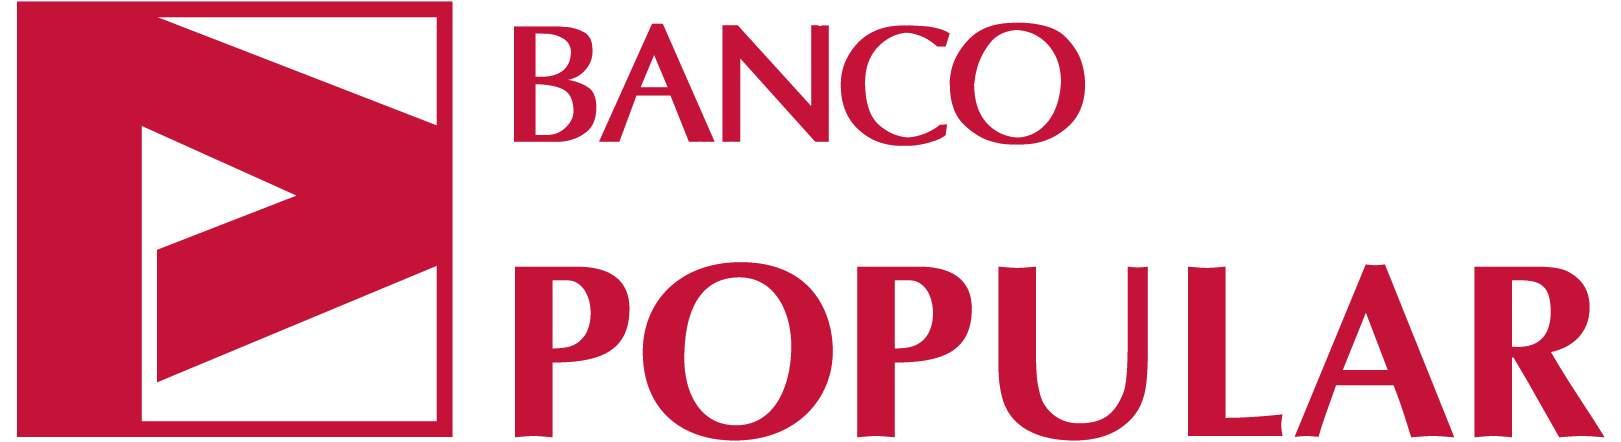 Hipoteca aliseda banco popular mejores pr stamos for Pisos banco popular aliseda